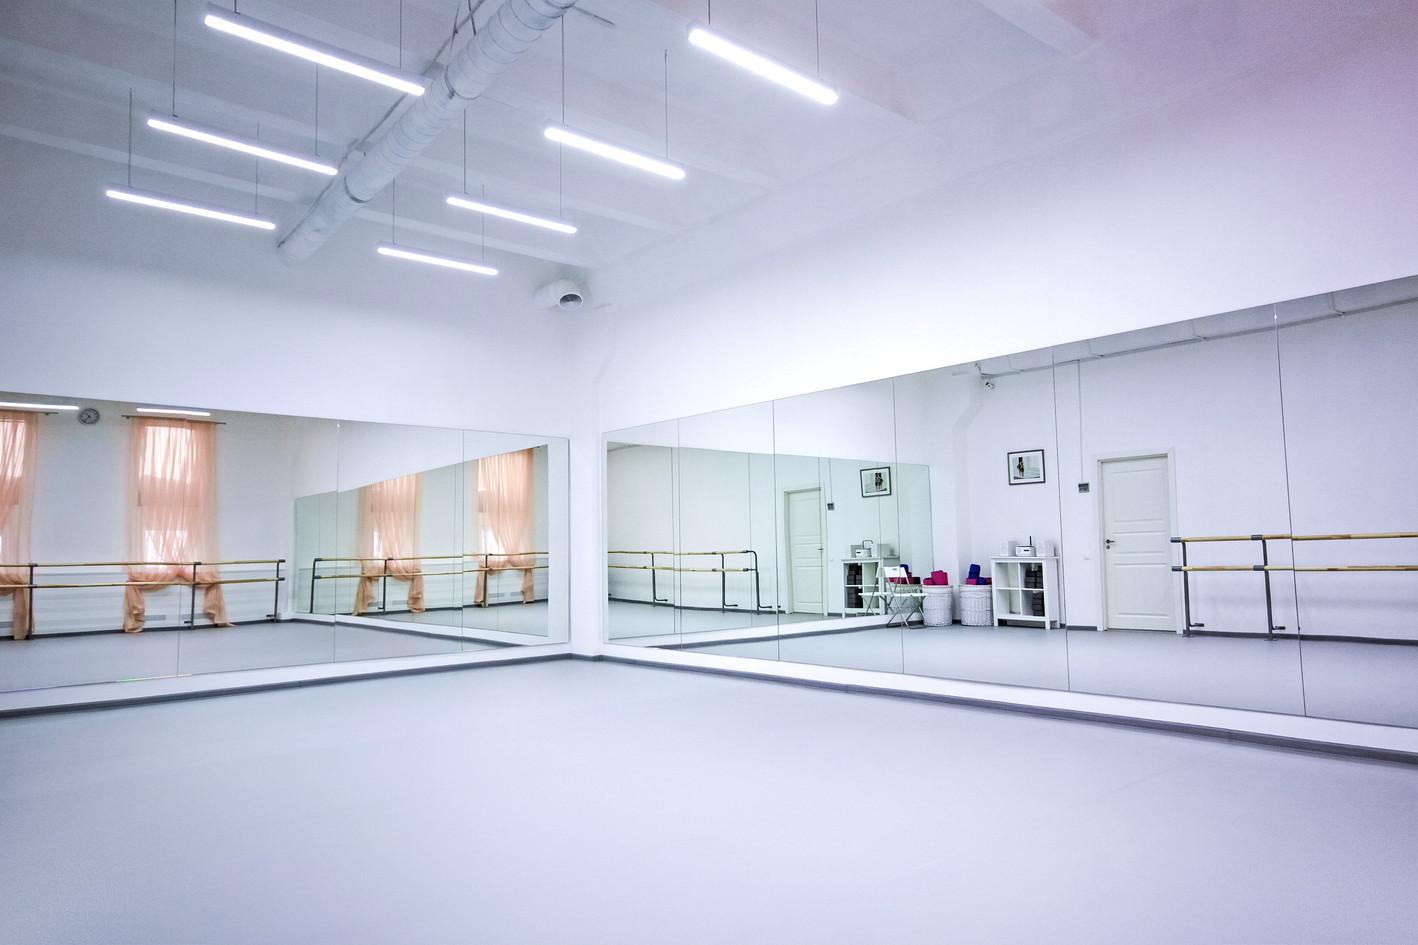 Grand salle